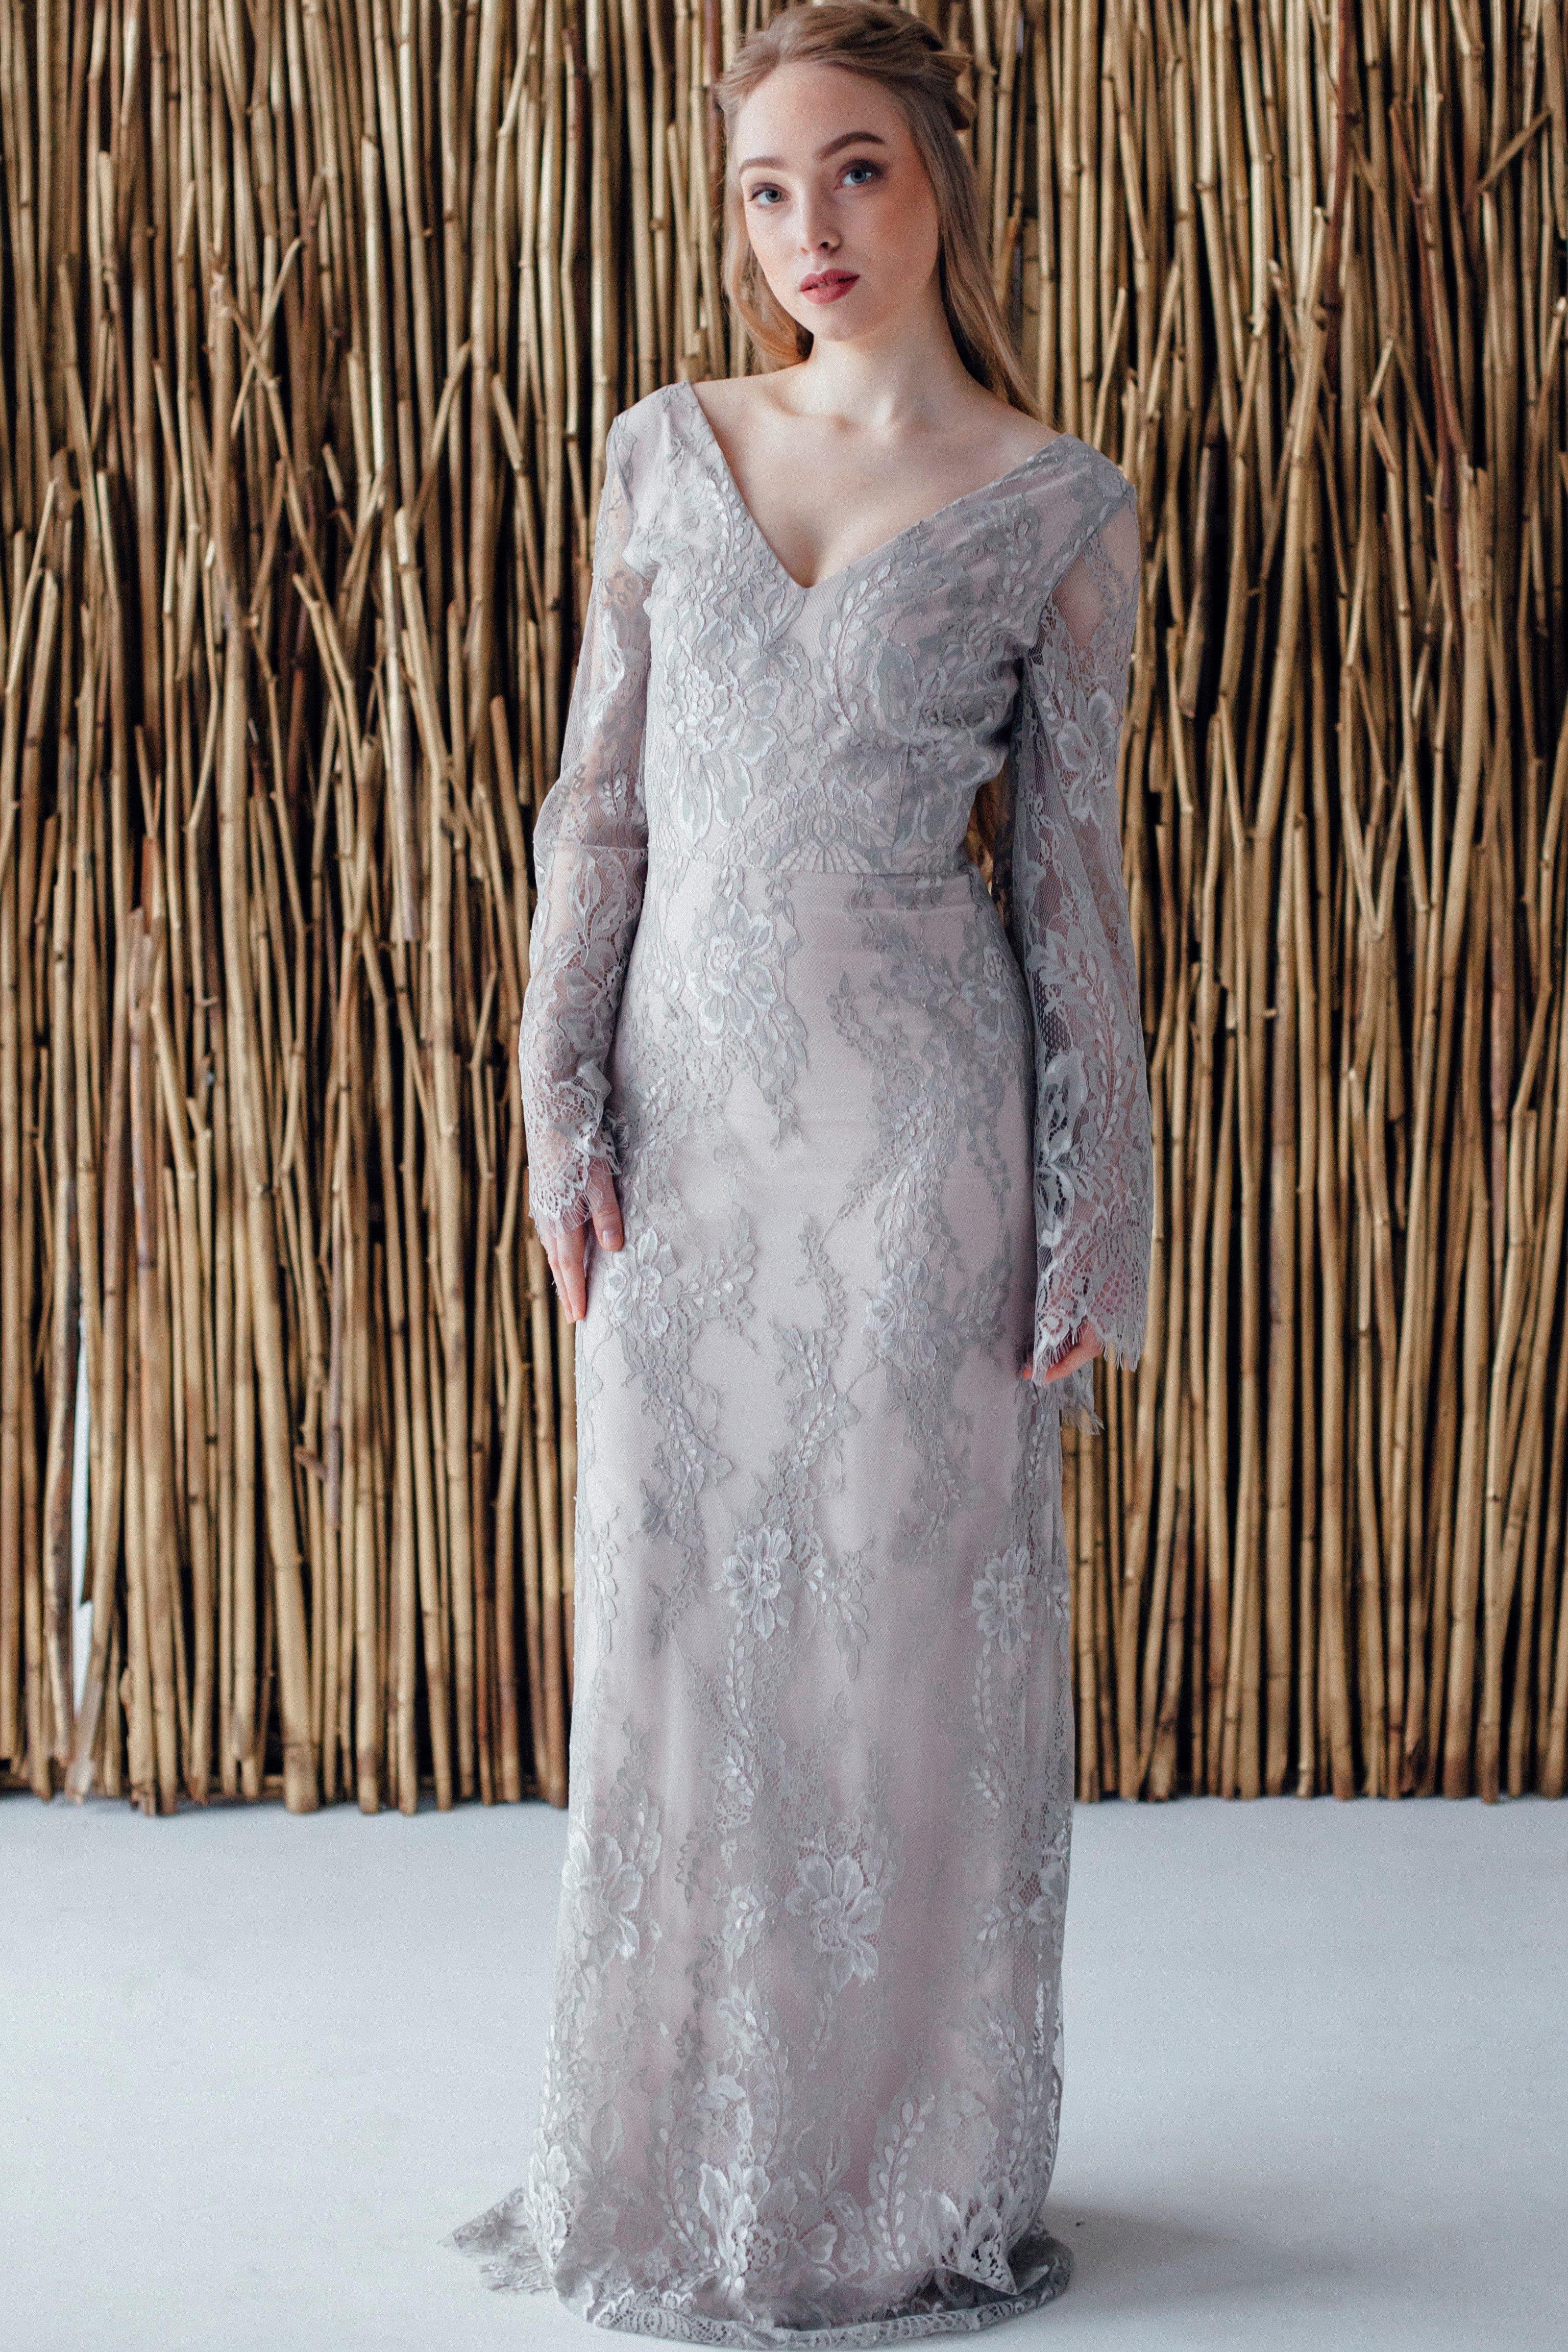 Свадебное платье NANA, коллекция MAGIC OF TENDERNESS, бренд LORA SONG, фото 1